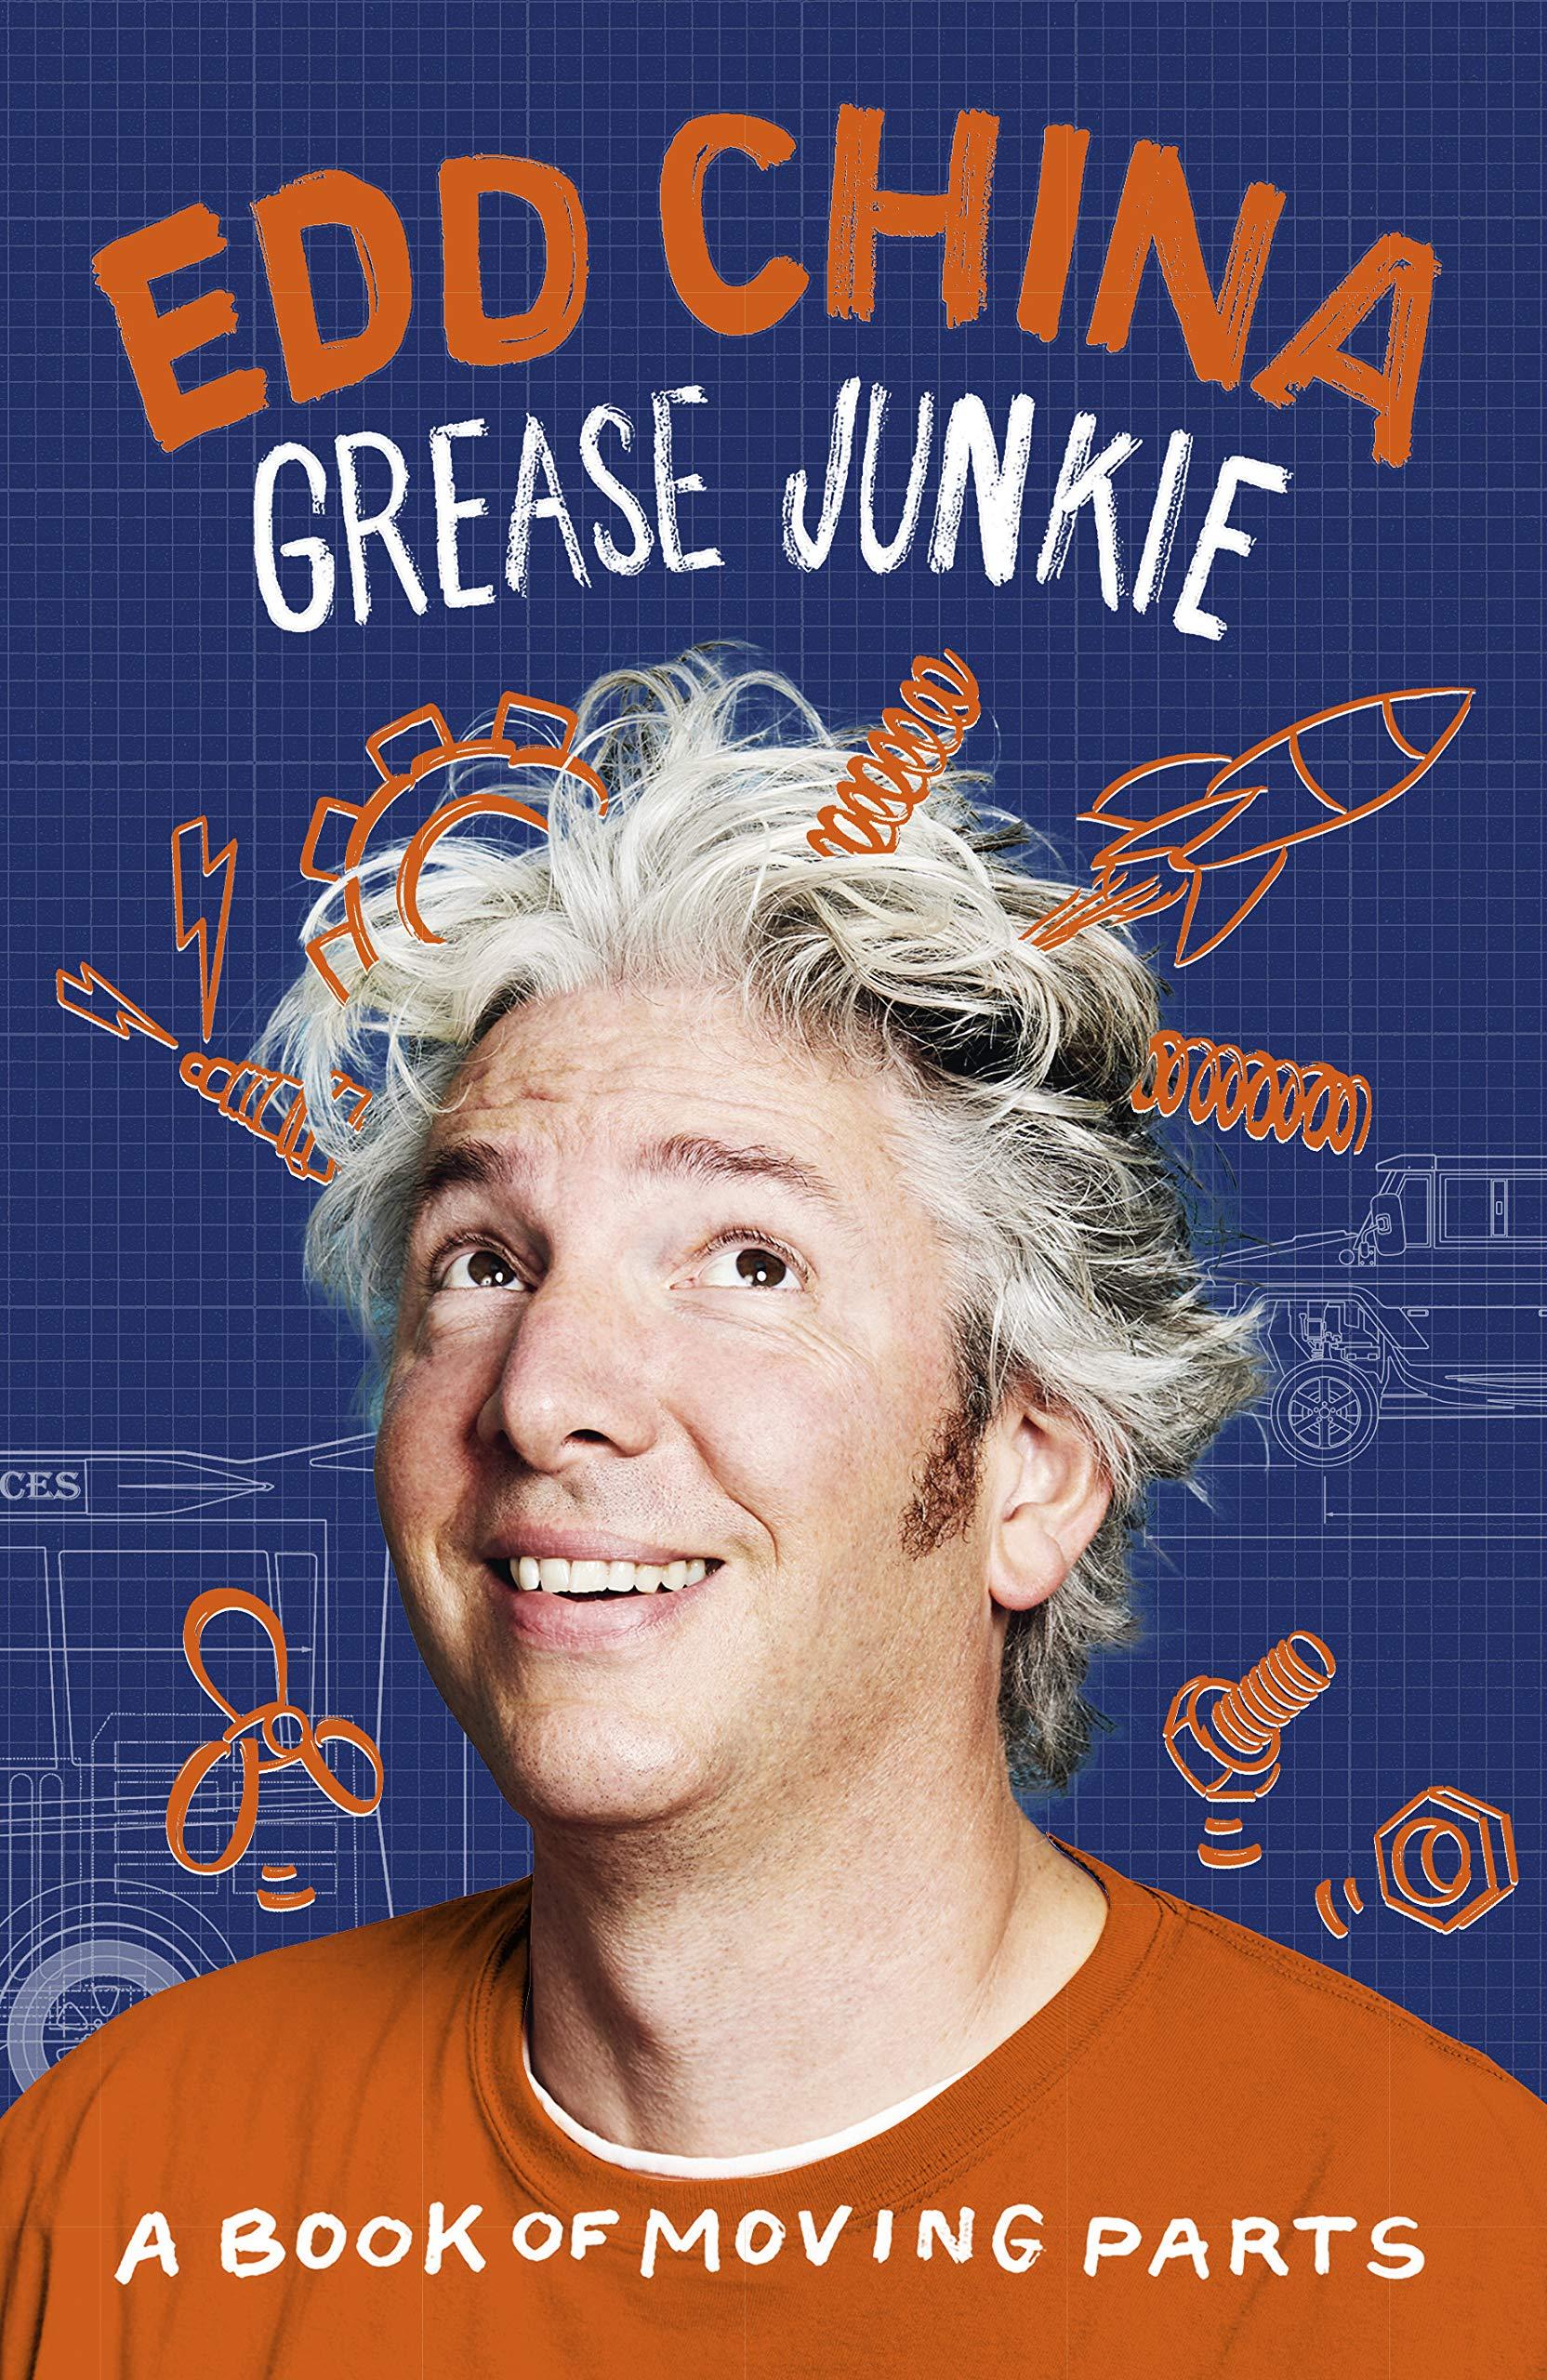 Grease Junkie: Edd China's Biography (Kindle Edition) 99p at Amazon